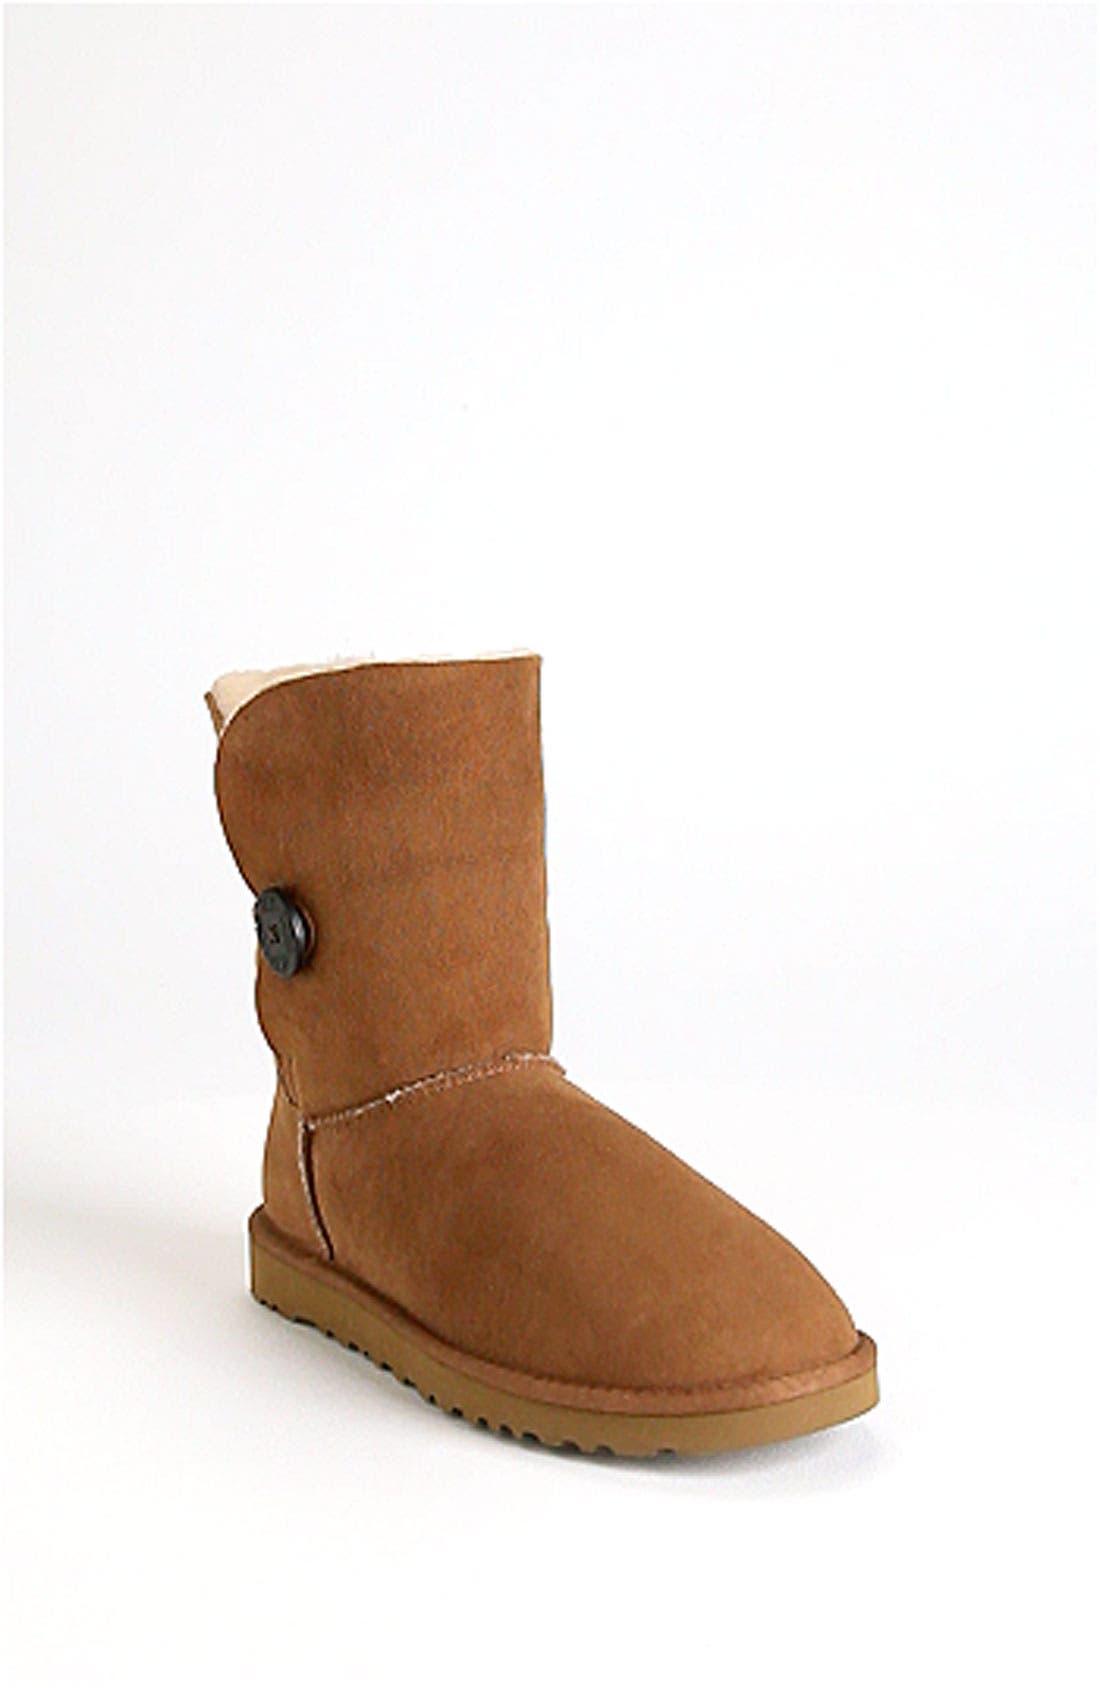 'Bailey Button' Boot,                             Alternate thumbnail 75, color,